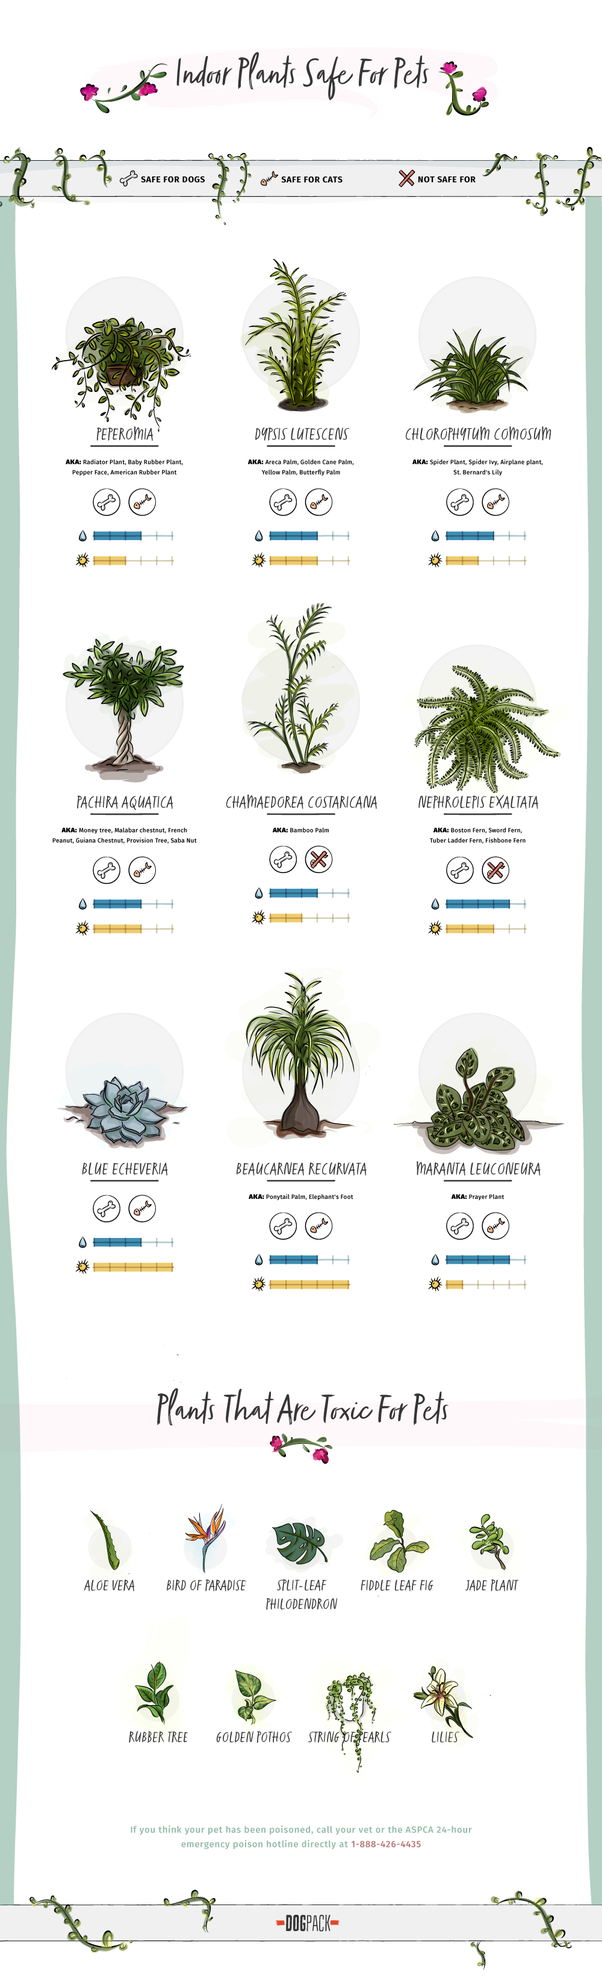 Are succulents poisonous? - Quora